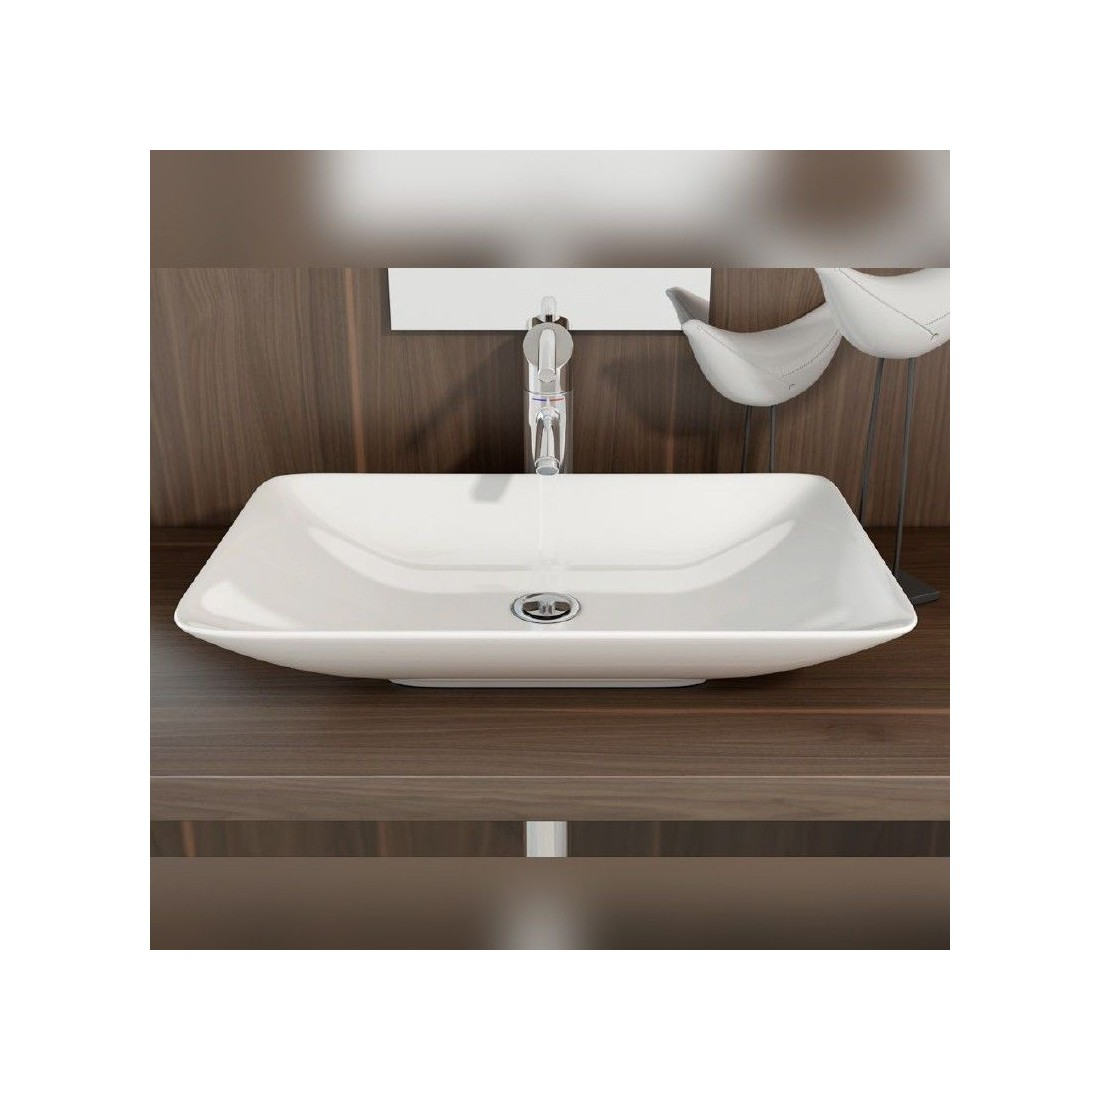 Lavabo cer mica sobre encimera nova the bath - Lavabo sobre encimera ...